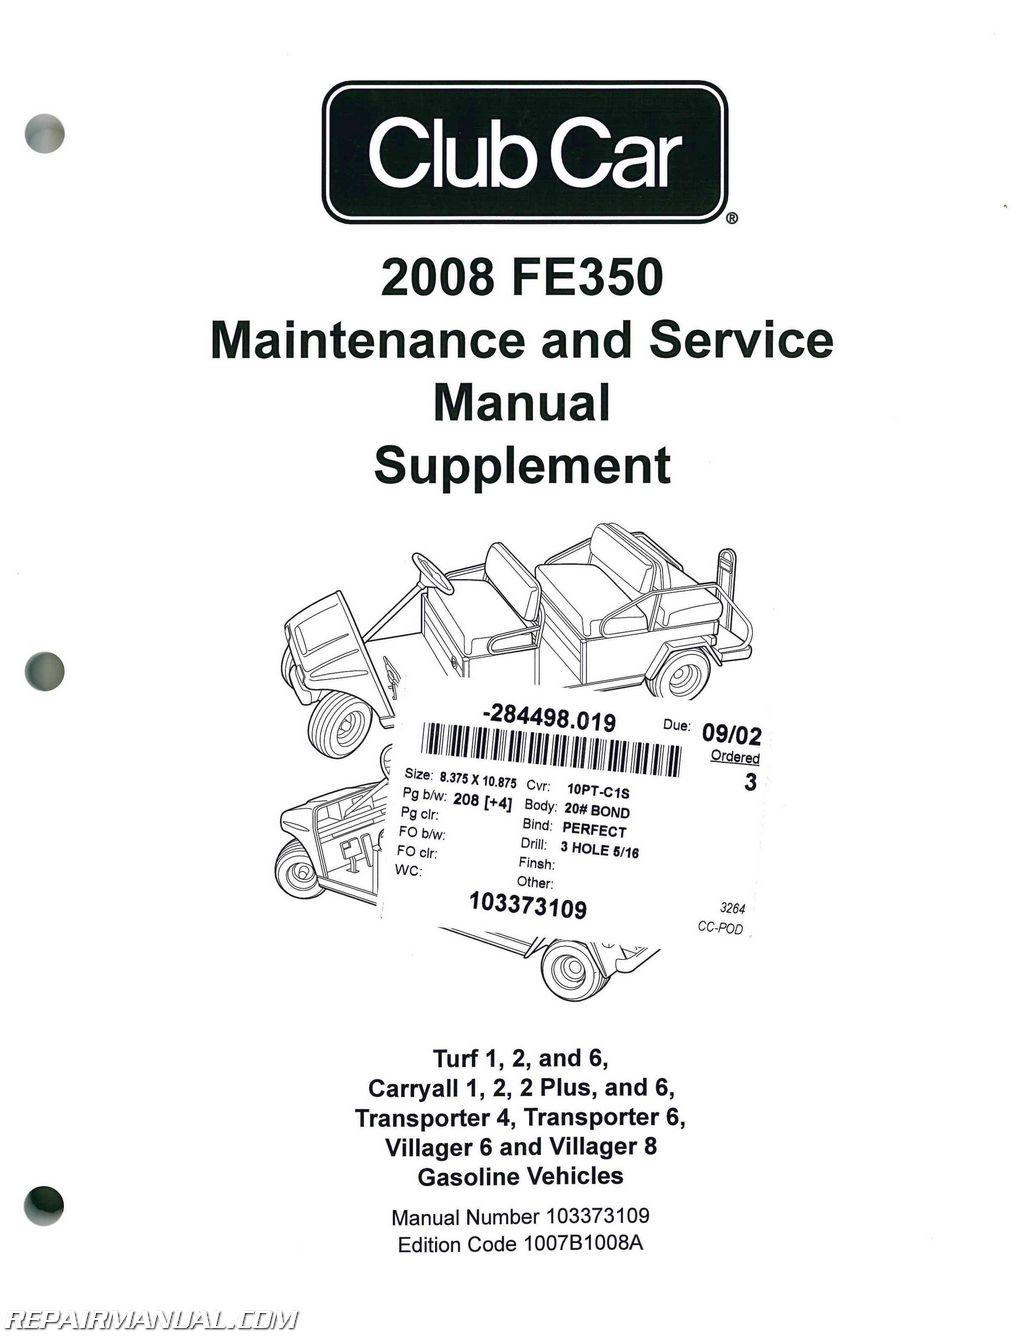 Details about 2008 Club Car FE350 Gasoline Maintenance Golf Cart Service on